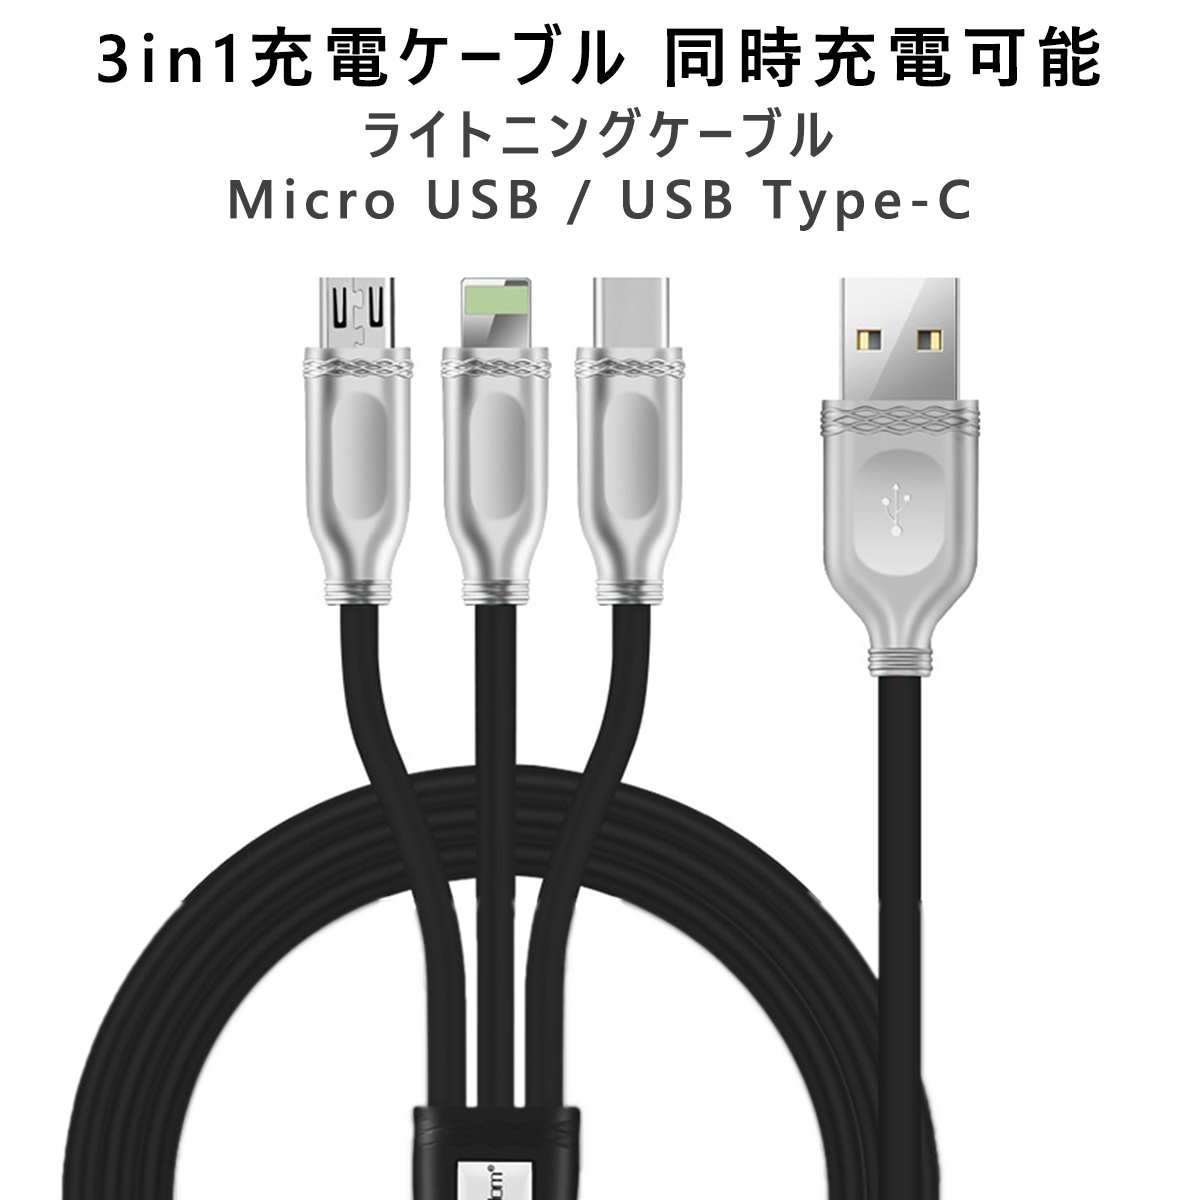 3in1 充電ケーブル 3A急速充電 充電専用 ライトニング ケーブル USB Type-C Micro USB ケーブル 同時給電可能 iPhone iPad Galaxy Xperia XZ 1本3役 多機種対応 高耐久性 1.2m ブラック SDM便送料無料 1ヶ月保証 K&M